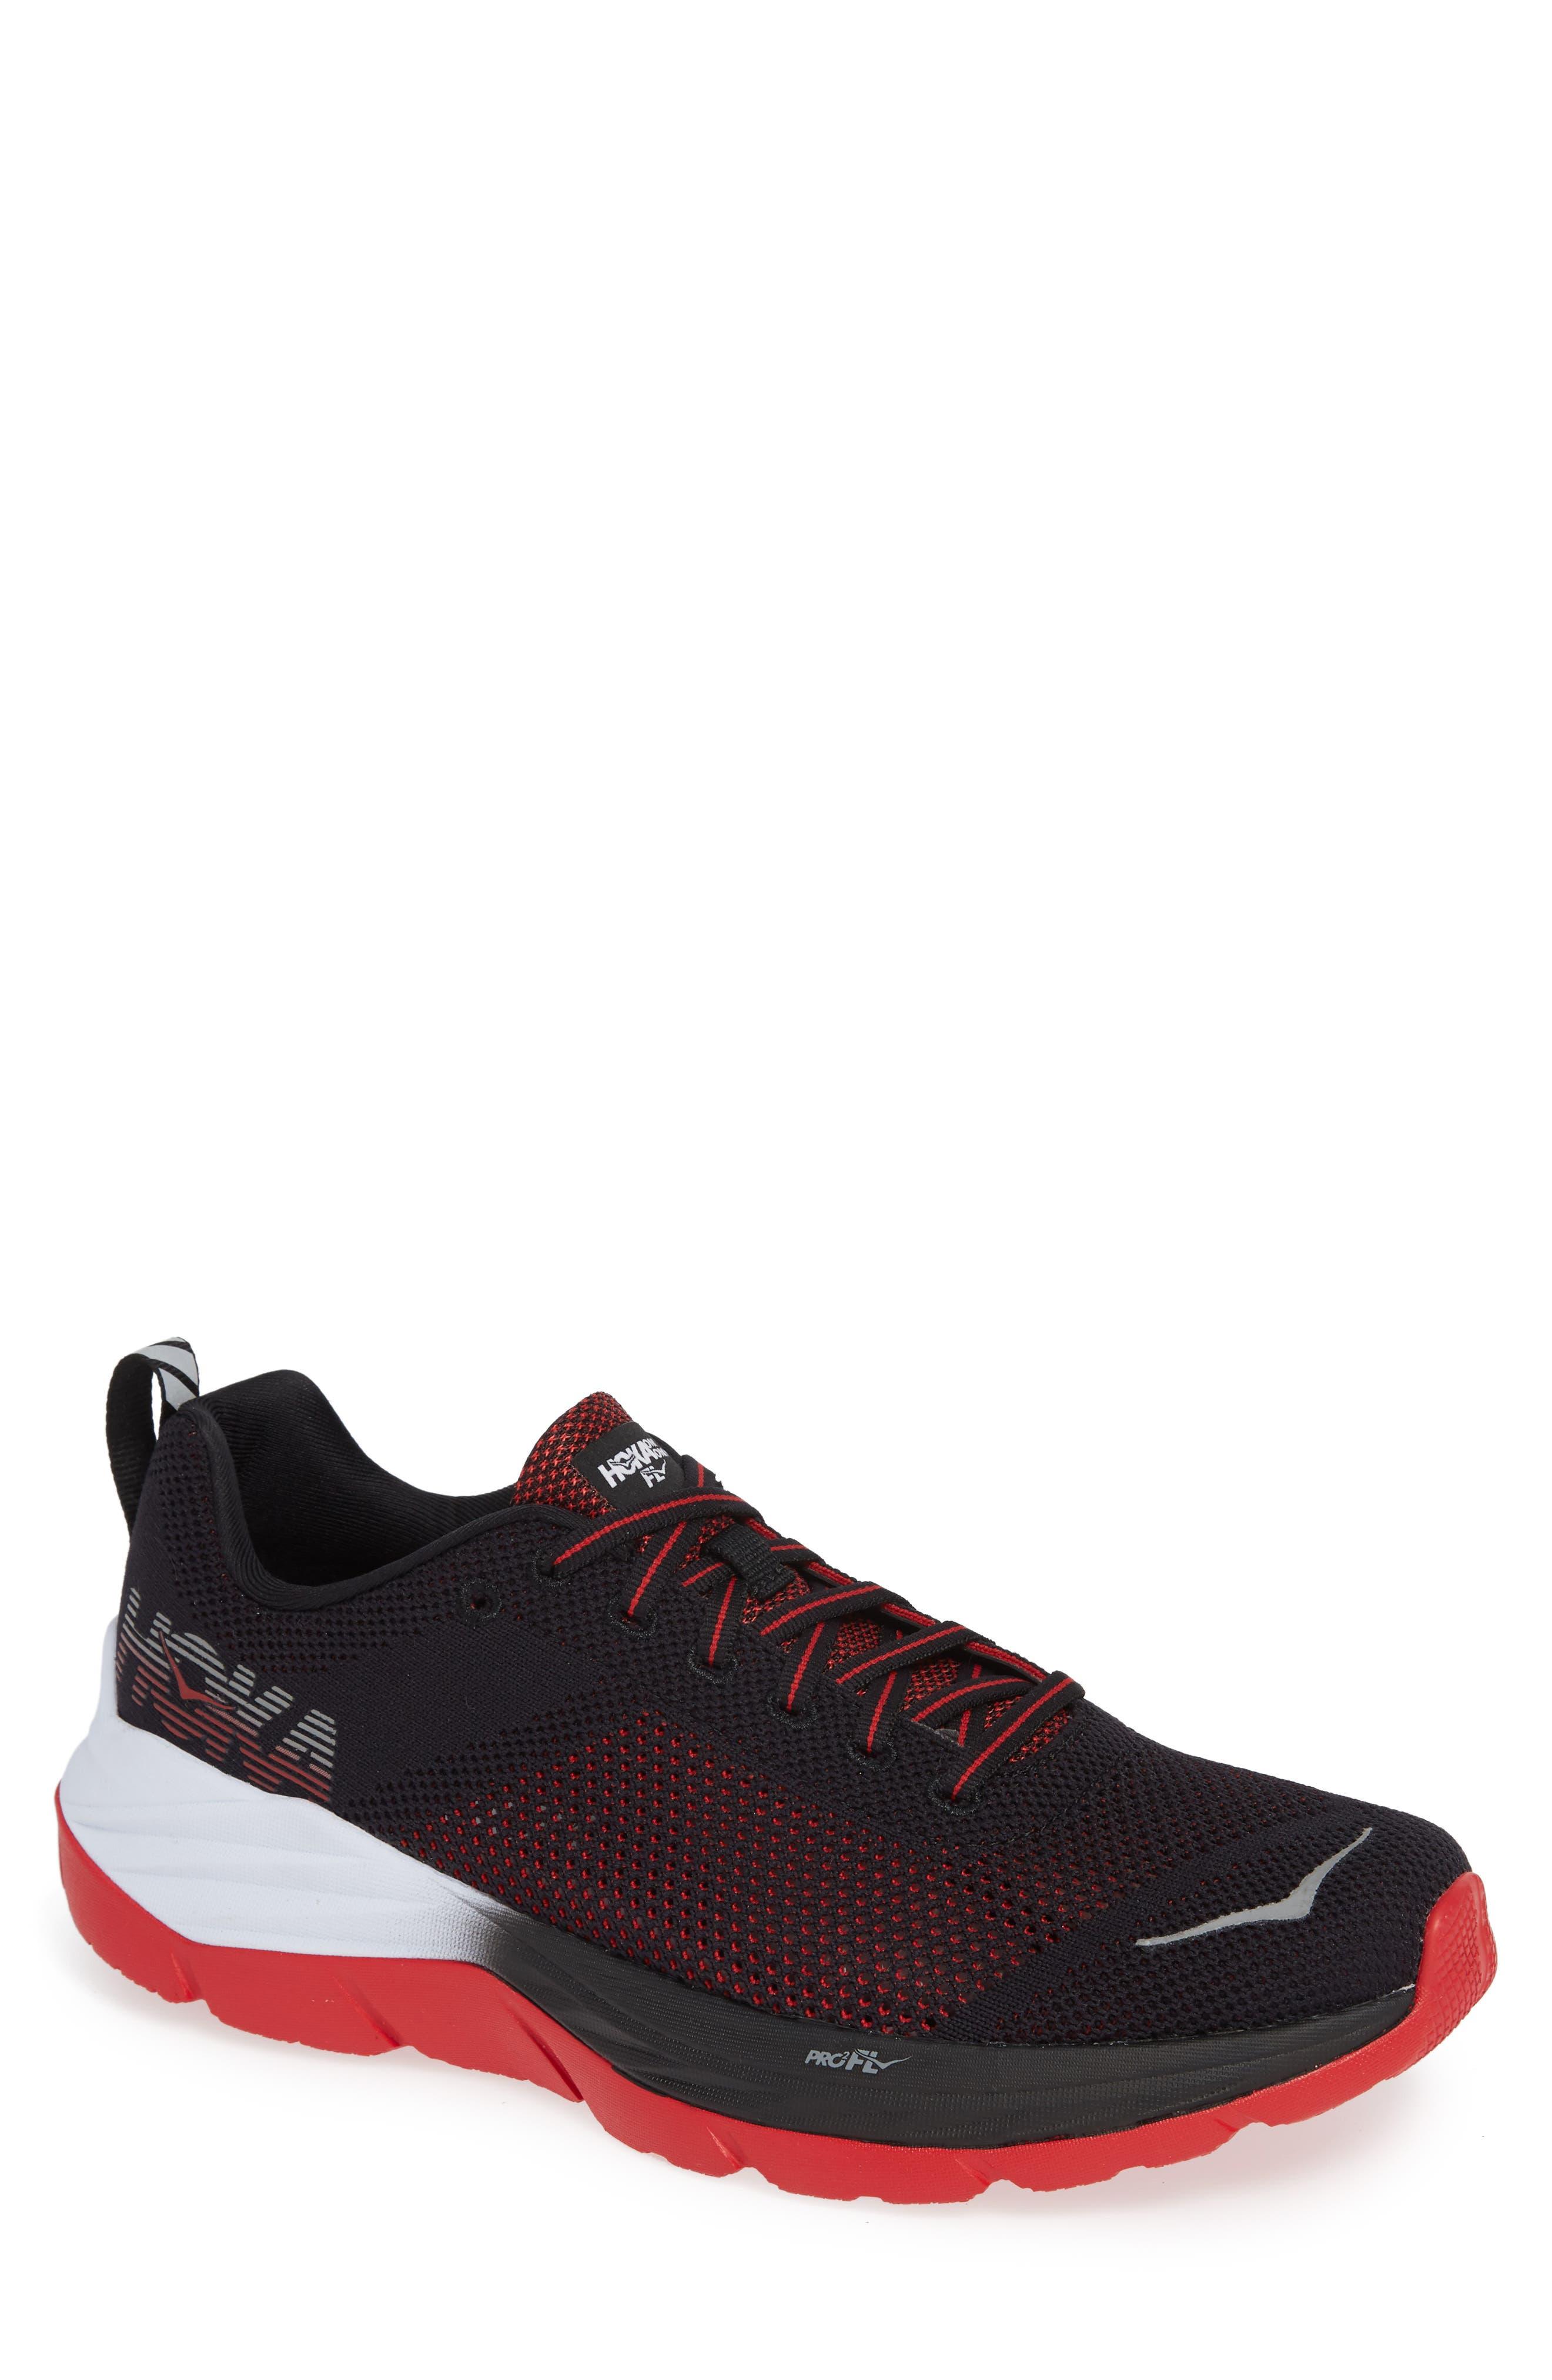 Hoka One One Mach Running Shoe